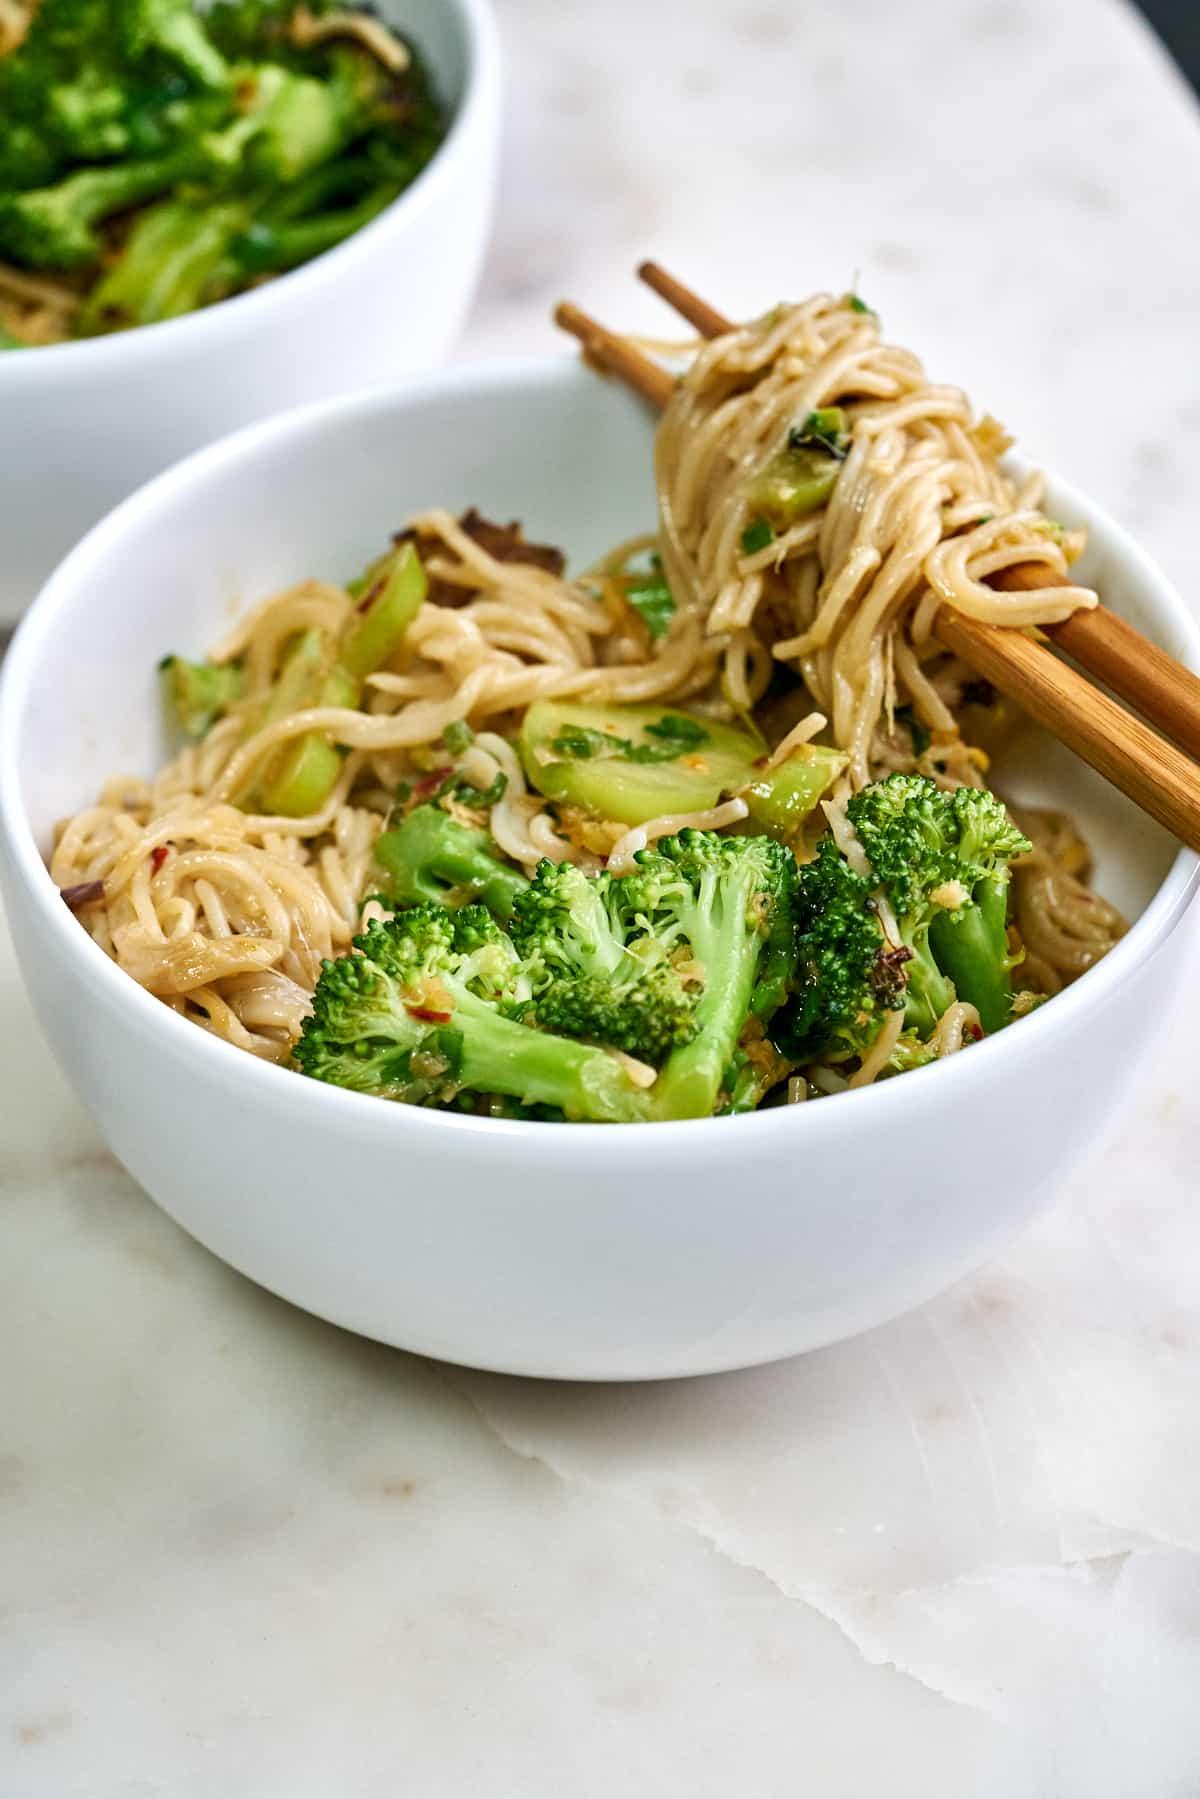 Noodles twirled on chopsticks.